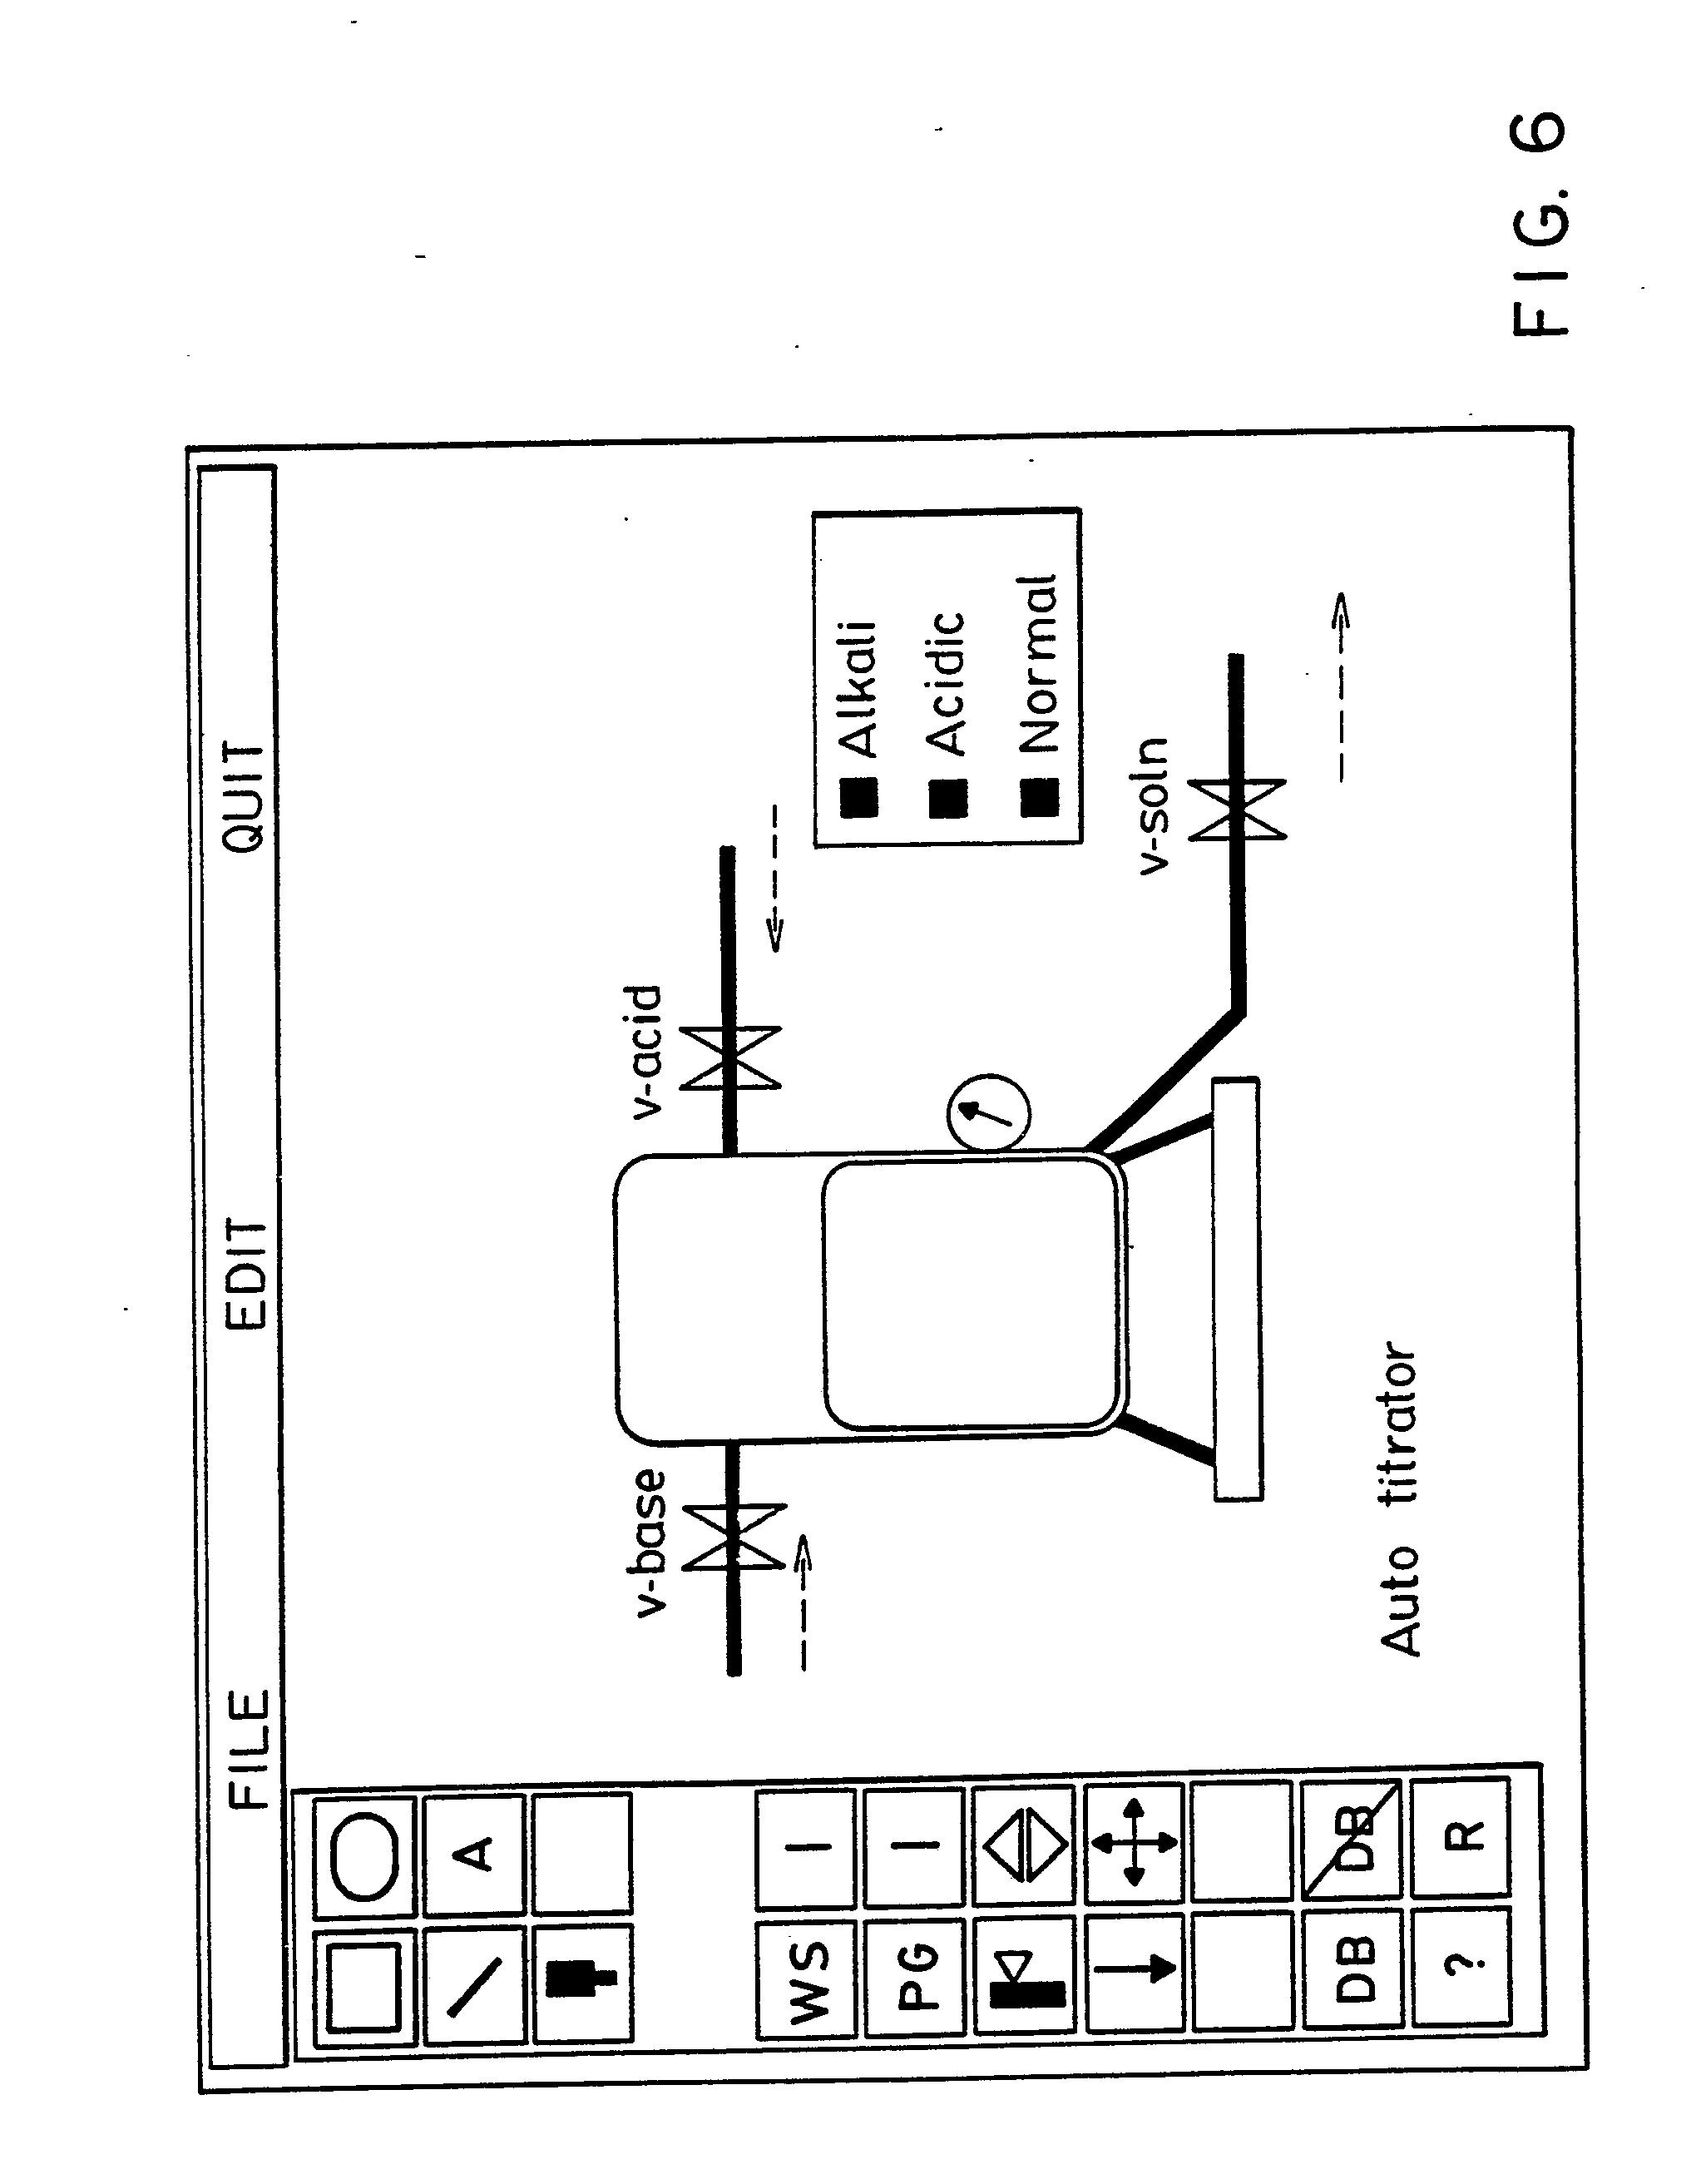 专利ep0367544a2 - commande